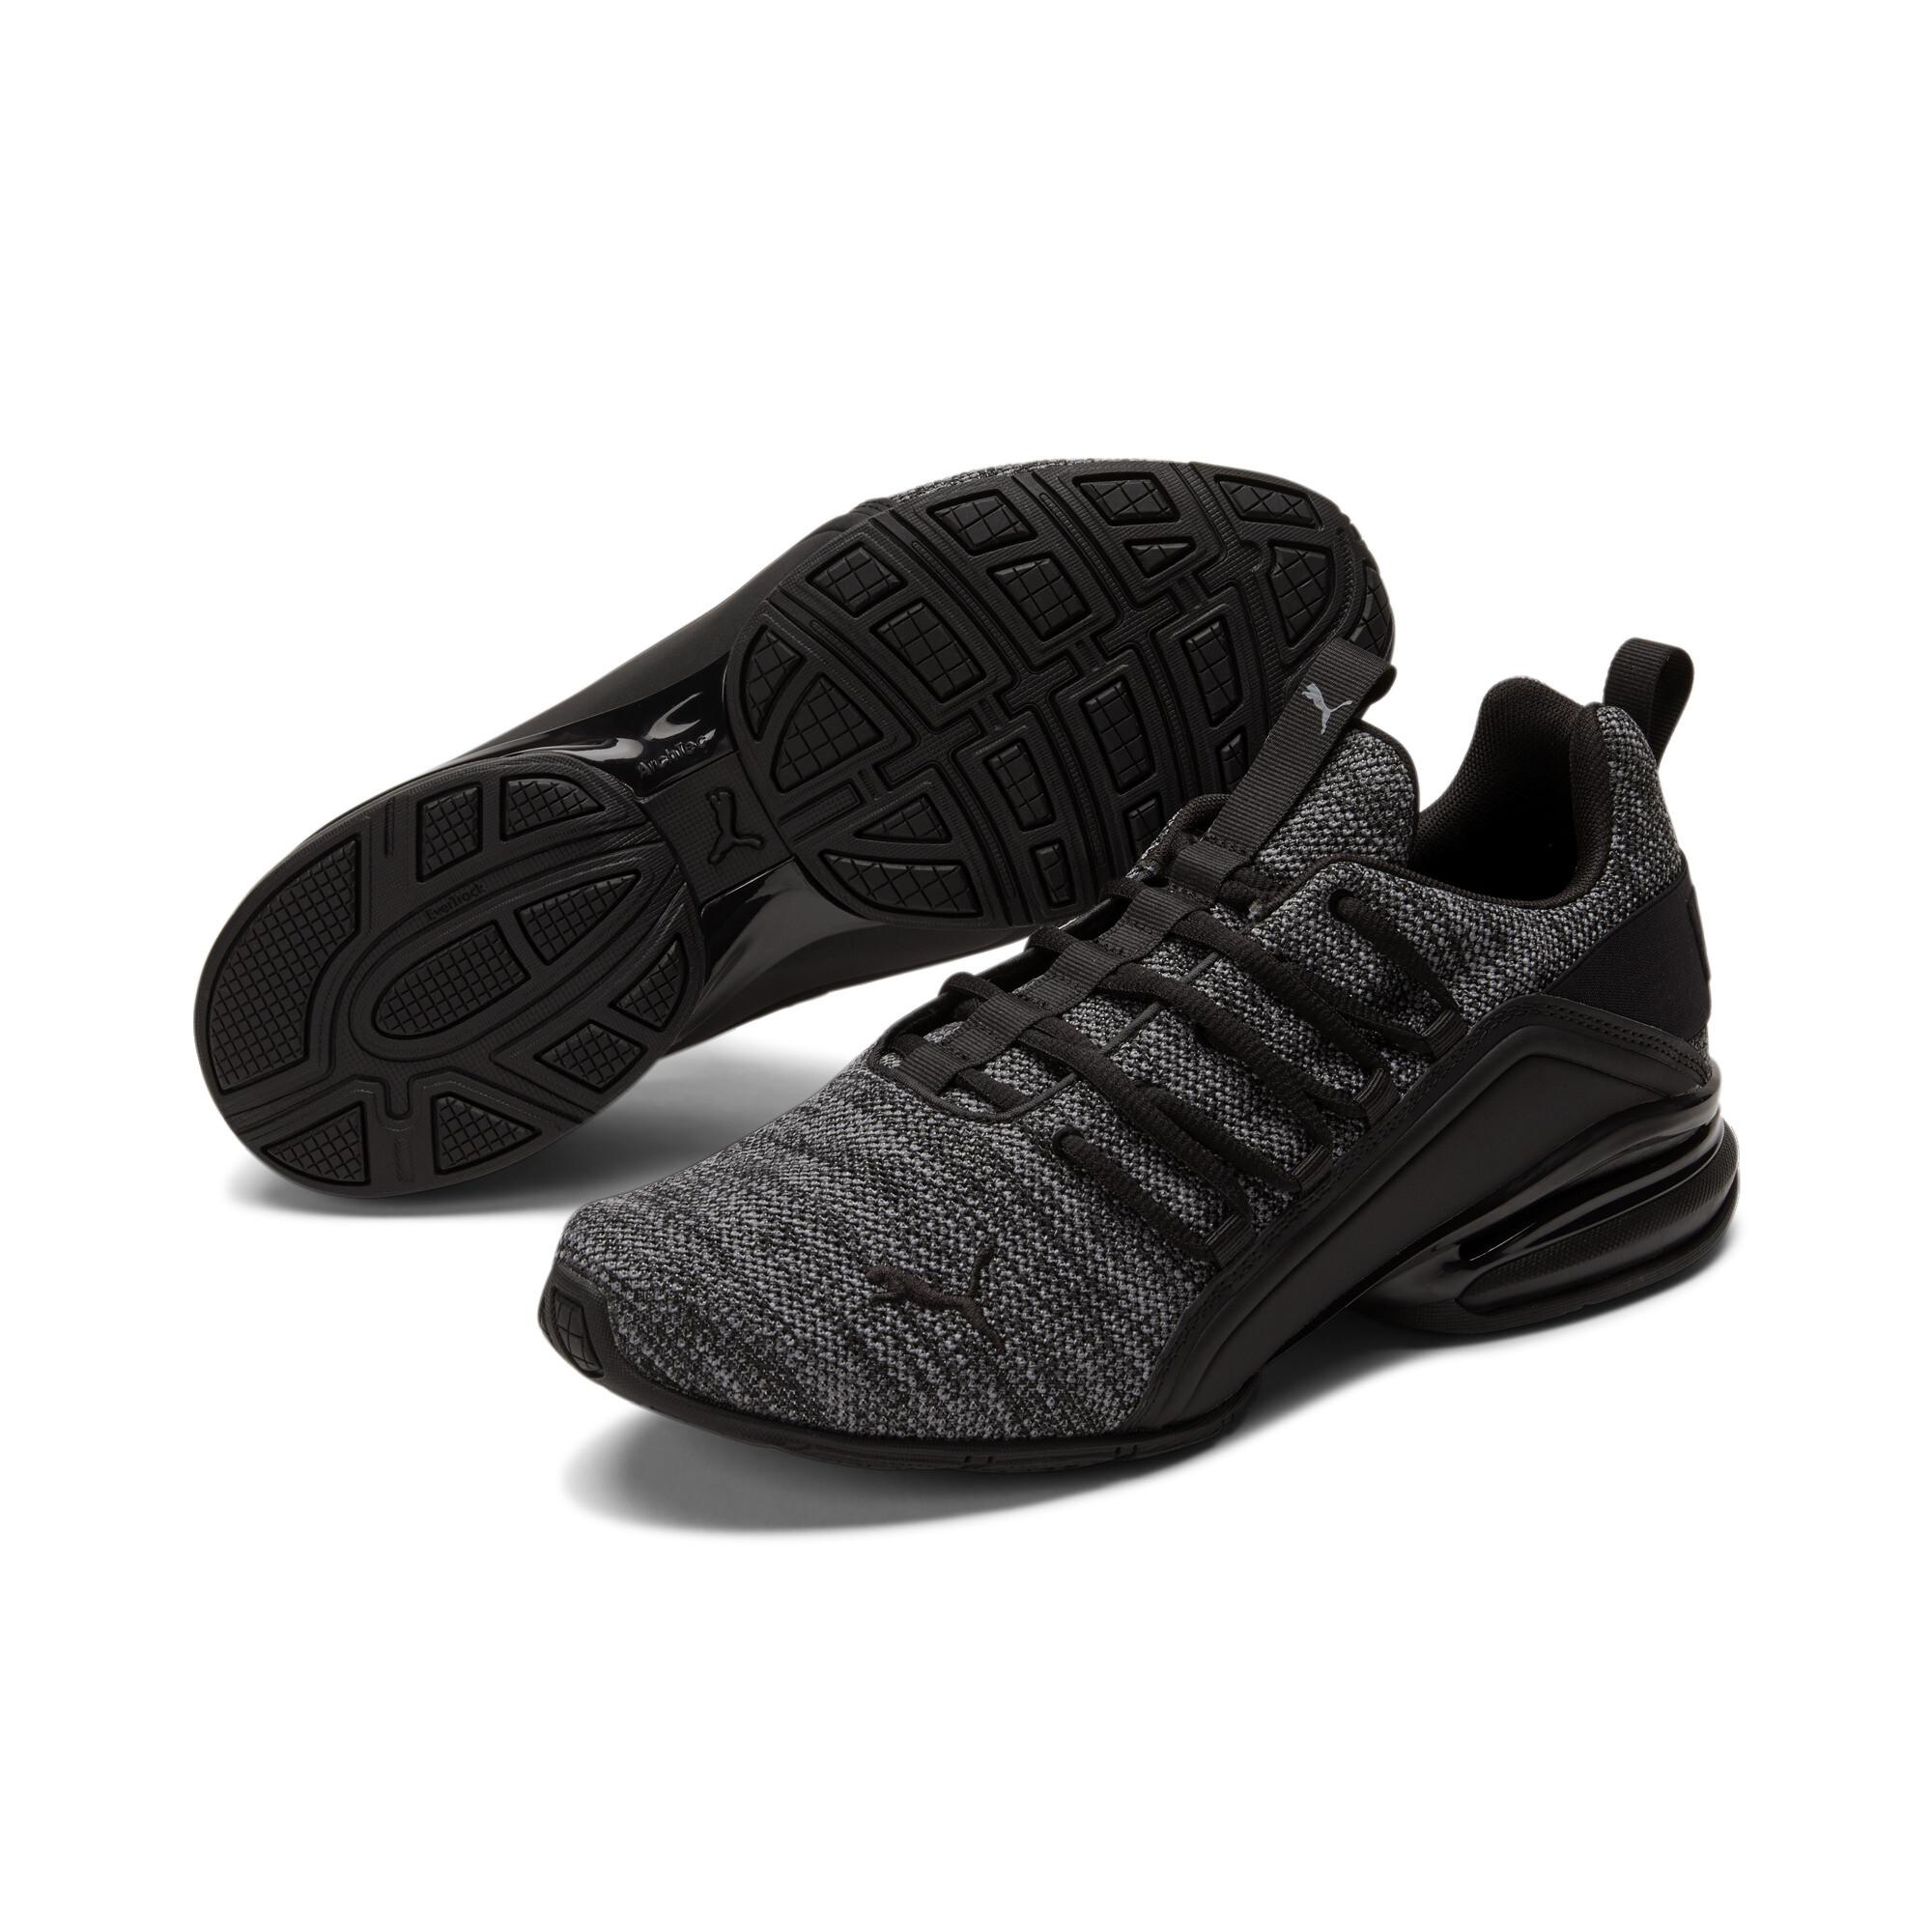 PUMA-Axelion-Men-039-s-Training-Shoes-Men-Shoe-Running thumbnail 10